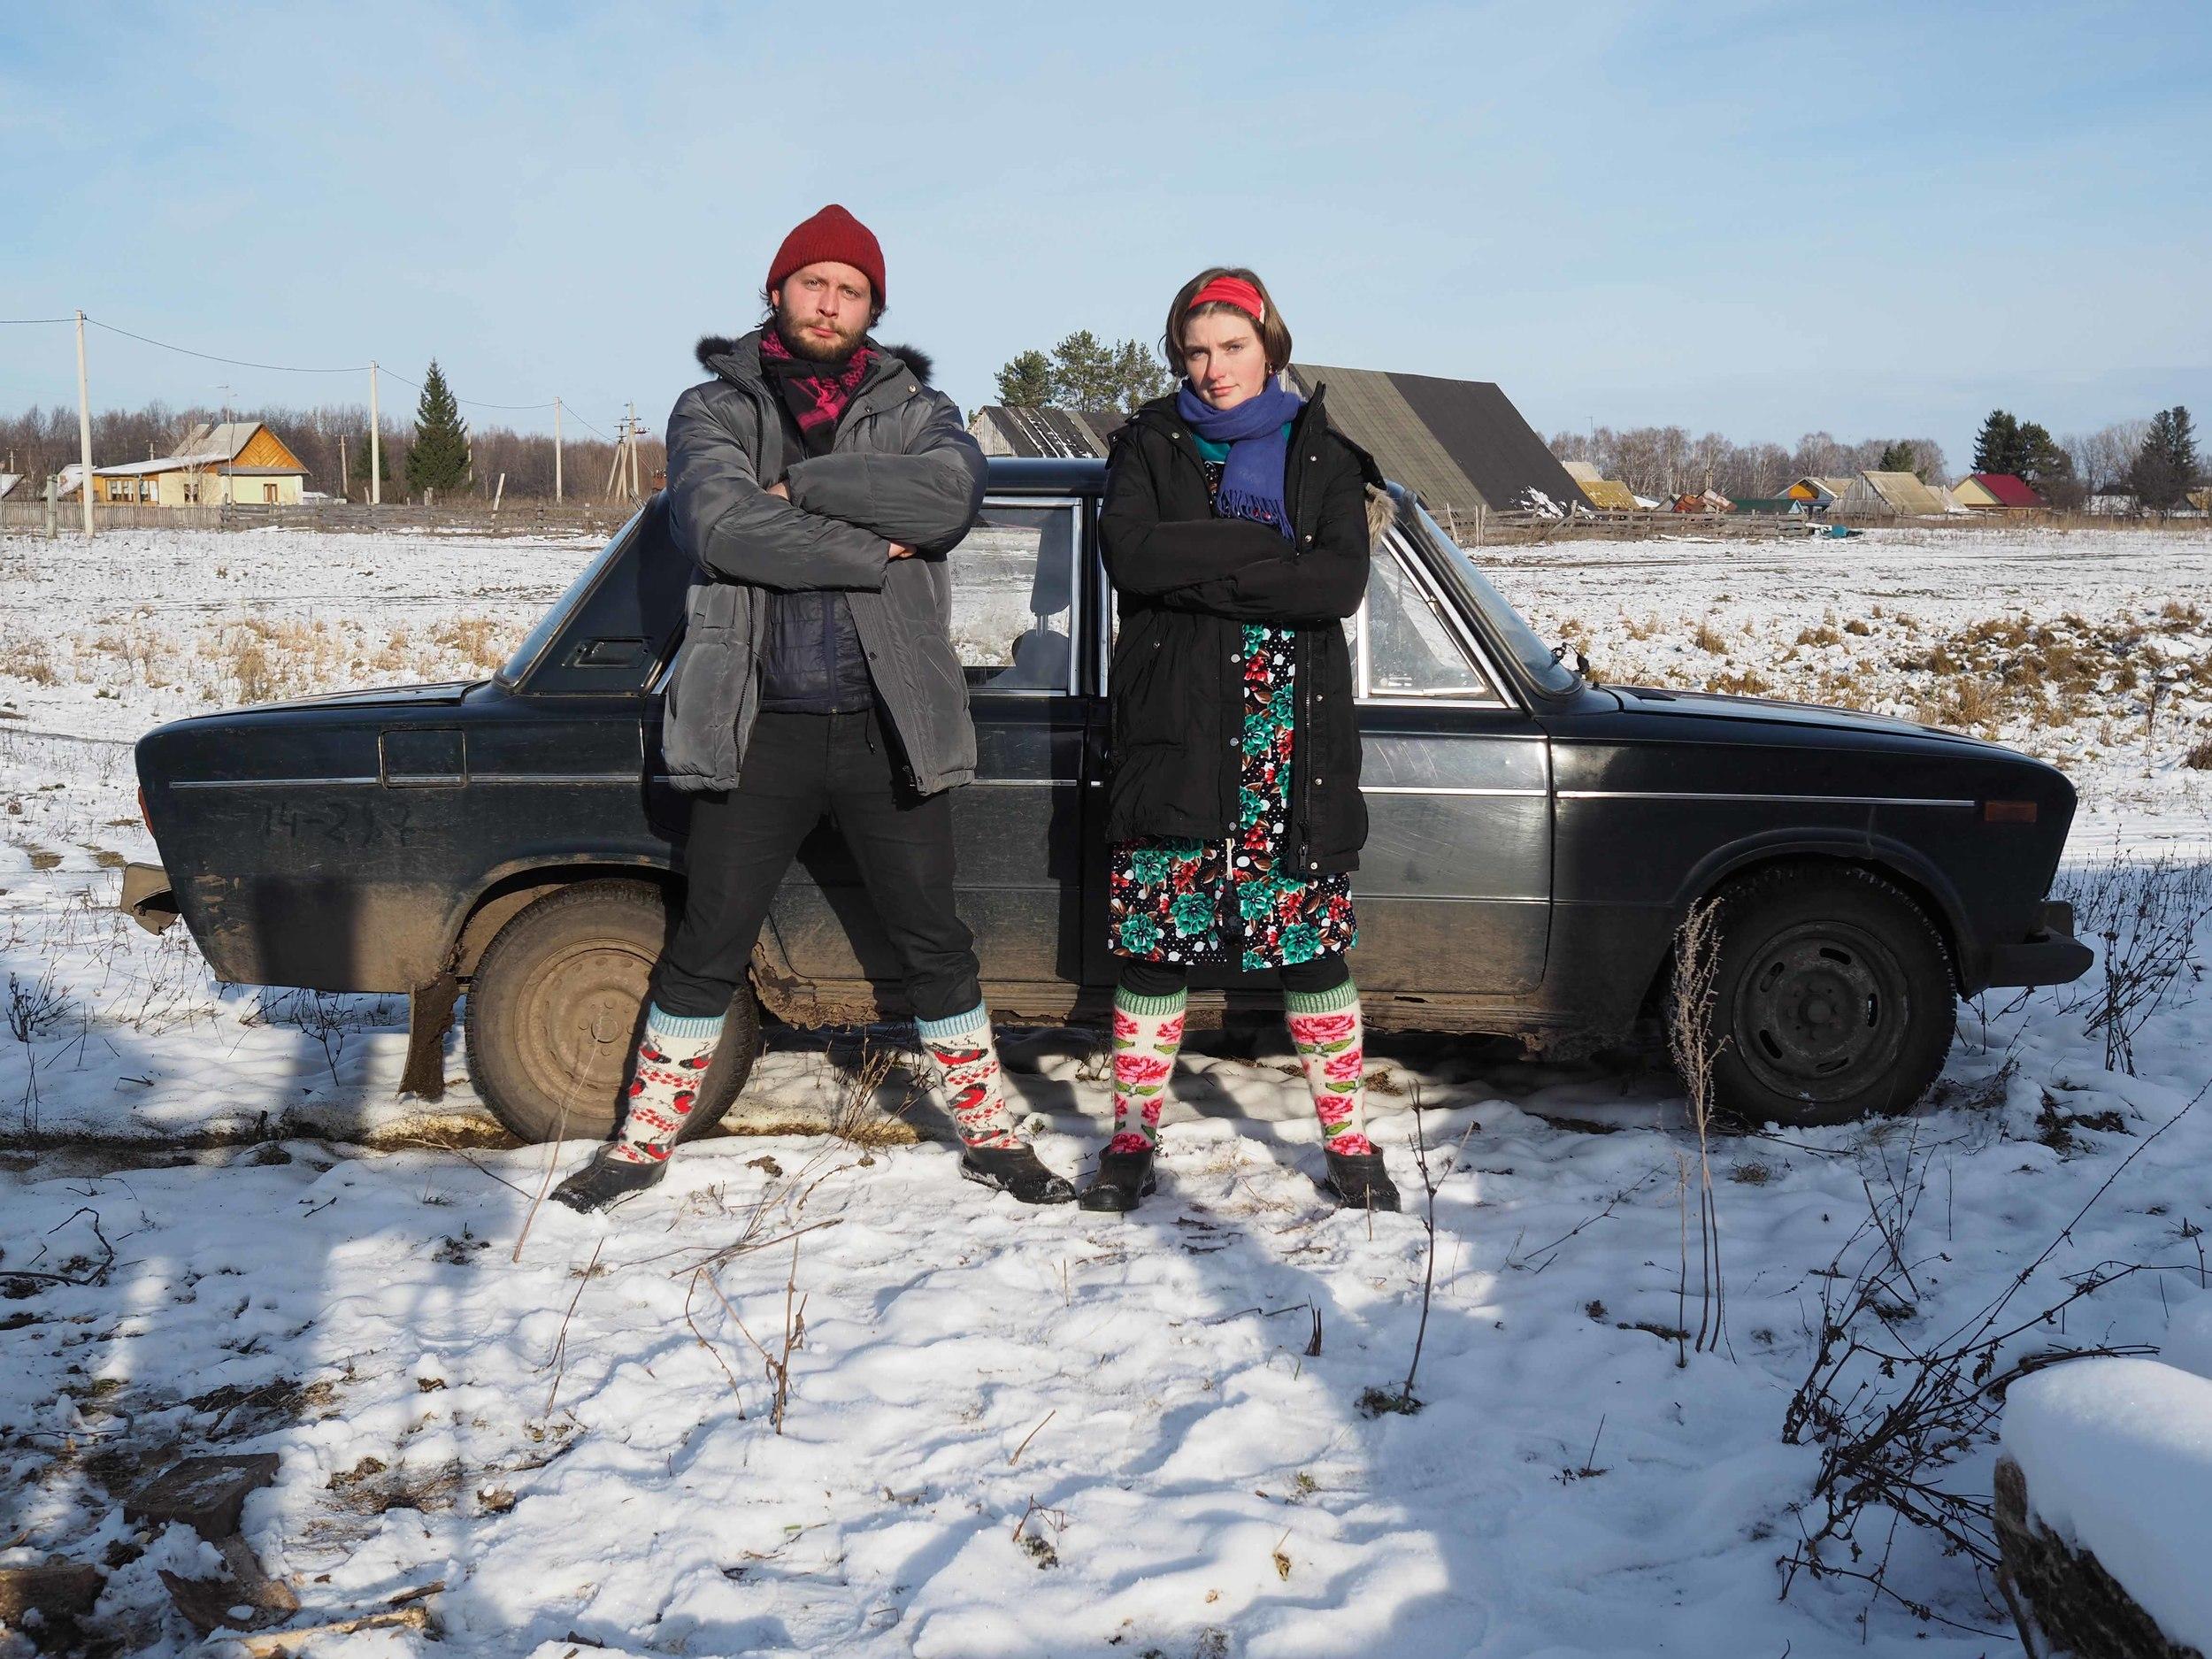 Kyzil Yar, Republic of Bashkortostan, Russia. November, 2015.